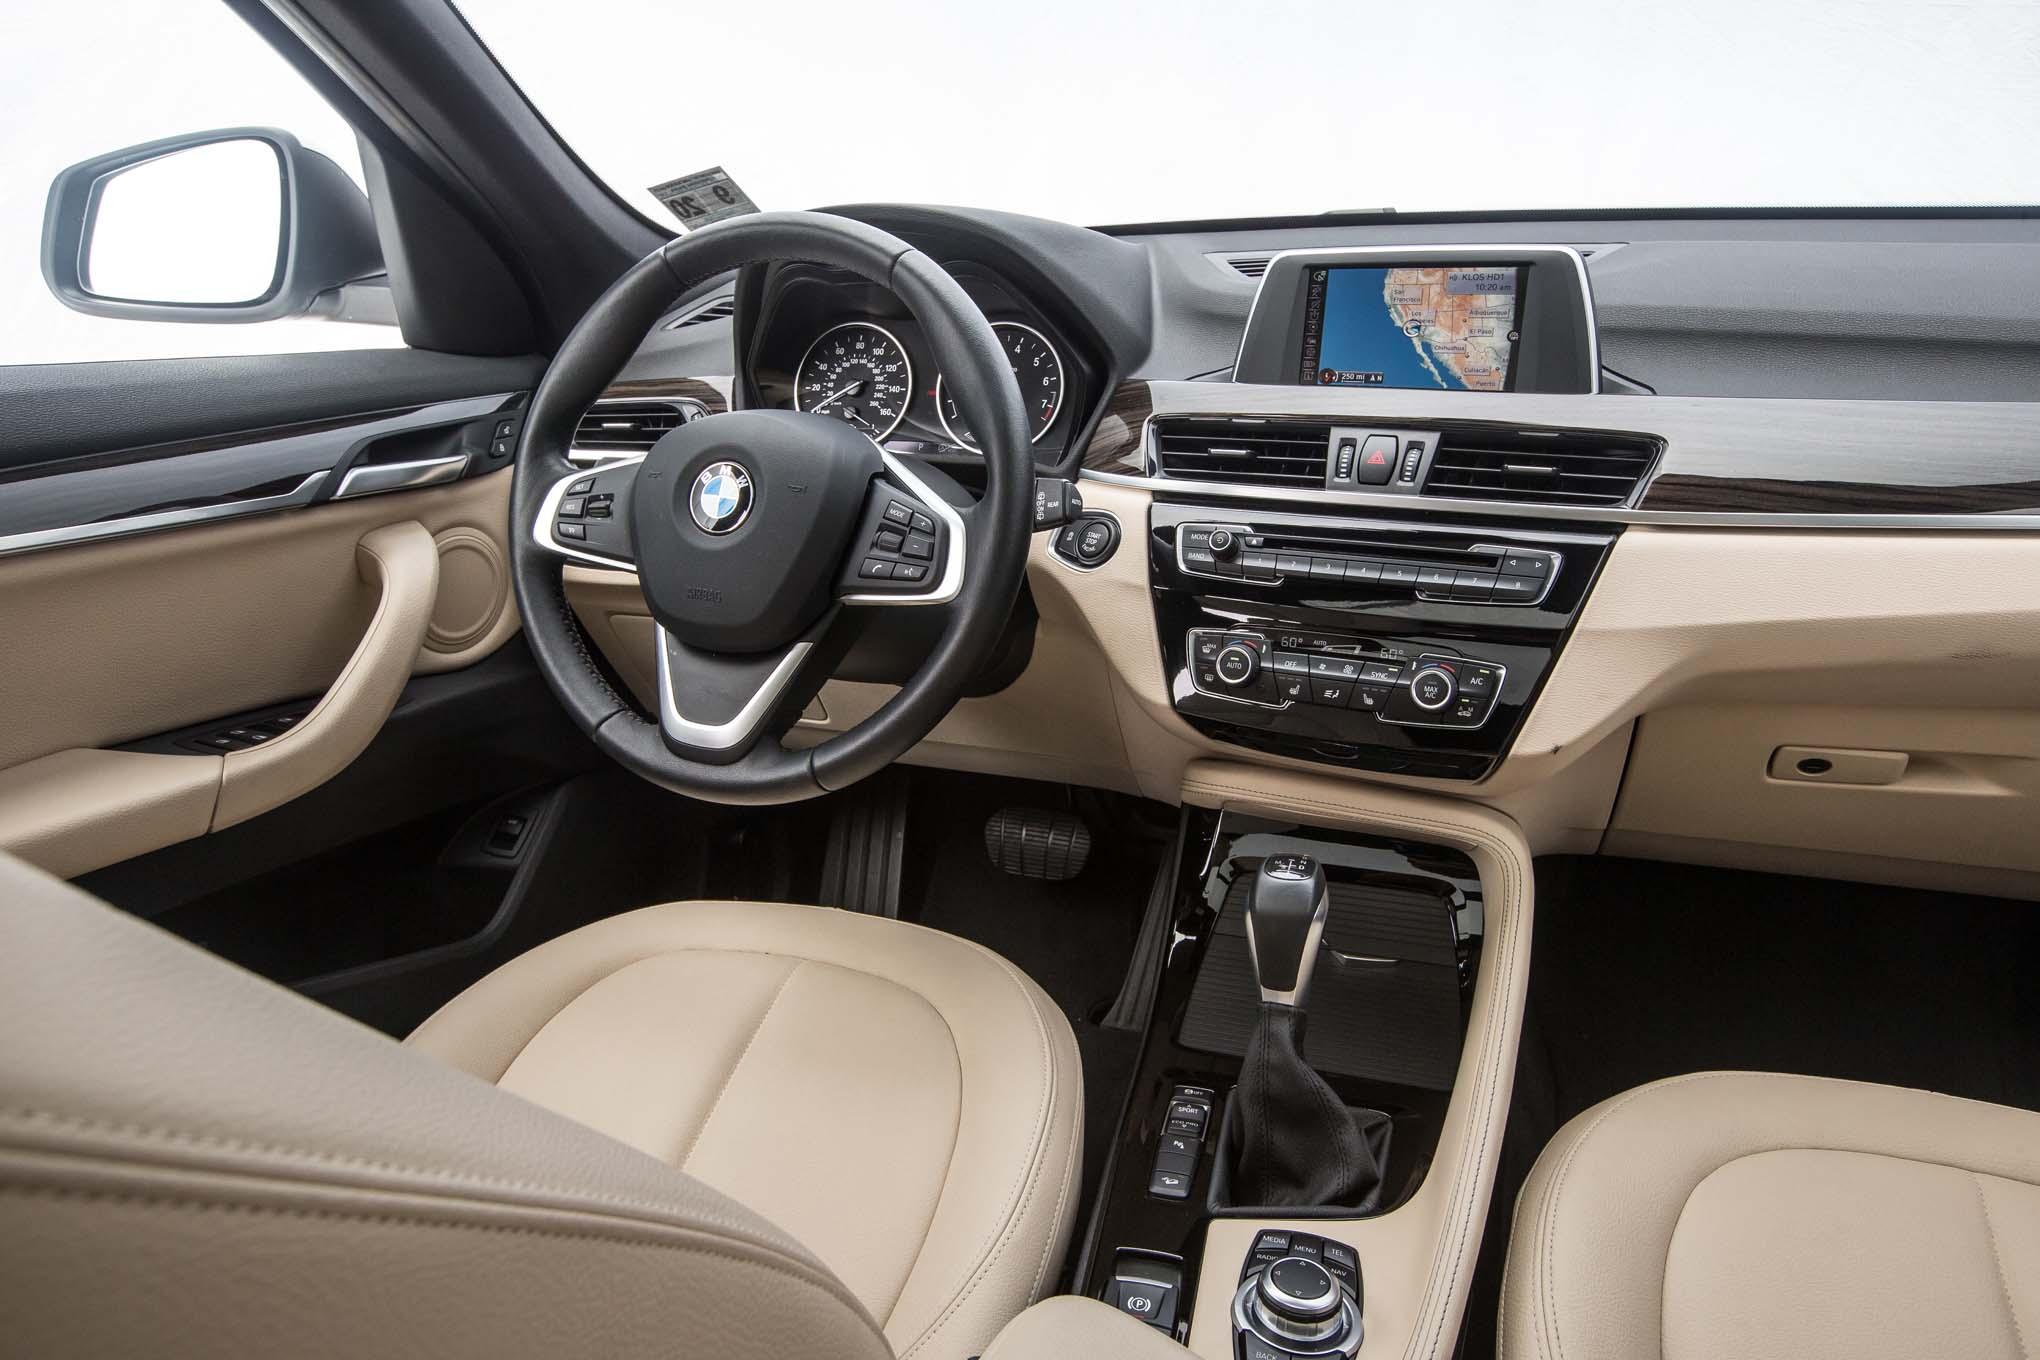 2016 Bmw X1 Xdrive28i Interior